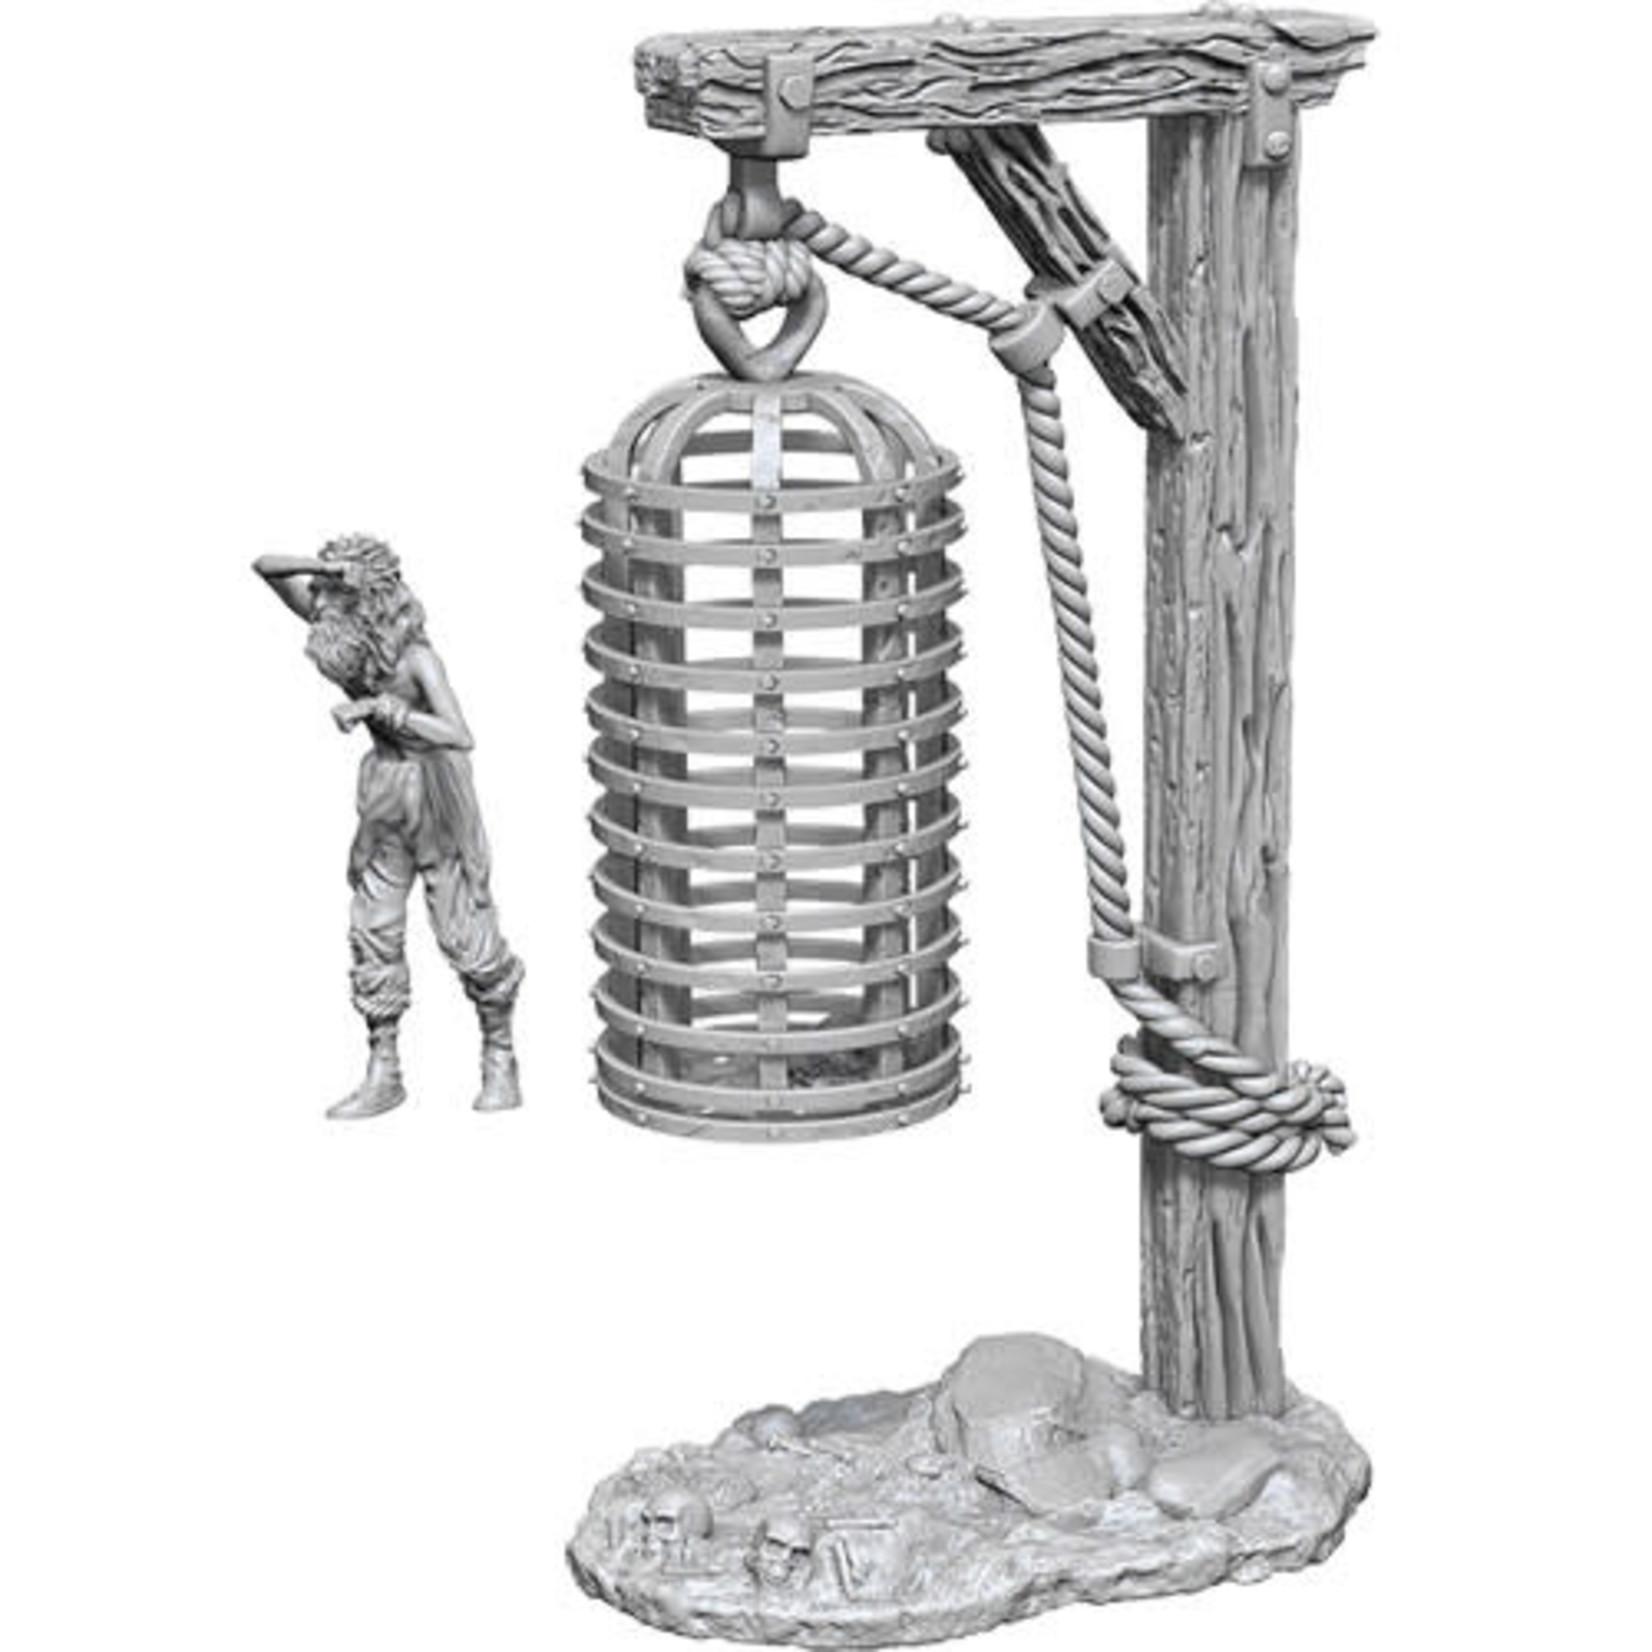 D&D Unpainted Minis: Hanging Cage (Wave 10)